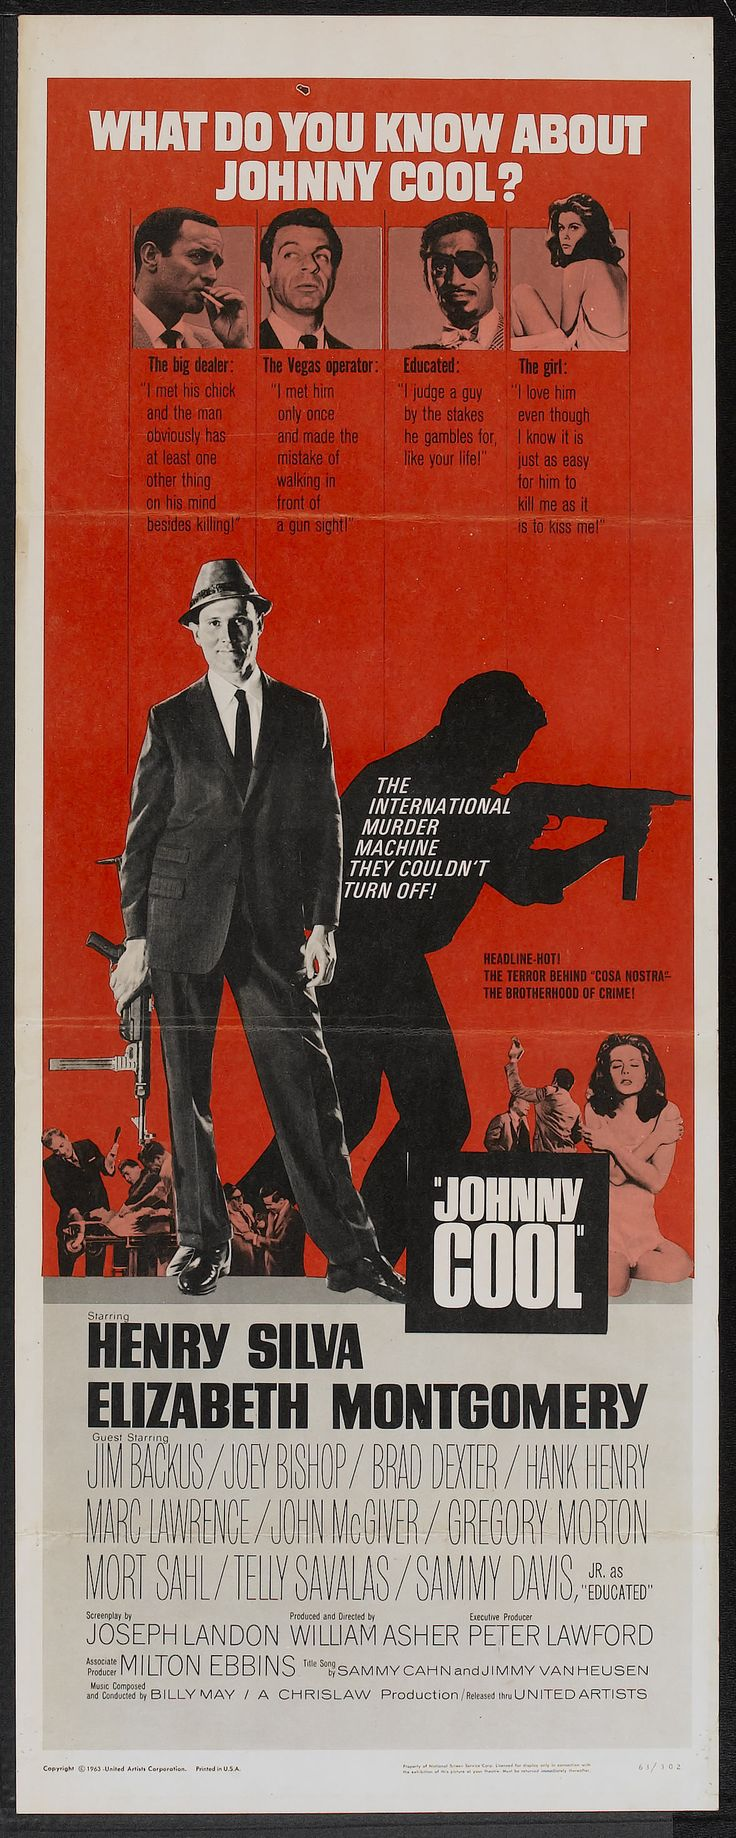 Johnny Cool (1963) Stars: Henry Silva, Elizabeth Montgomery, Richard Anderson, Jim Backus, Gregory Morton, Telly Savalas, Sammy Davis Jr. ~ Director: William Asher